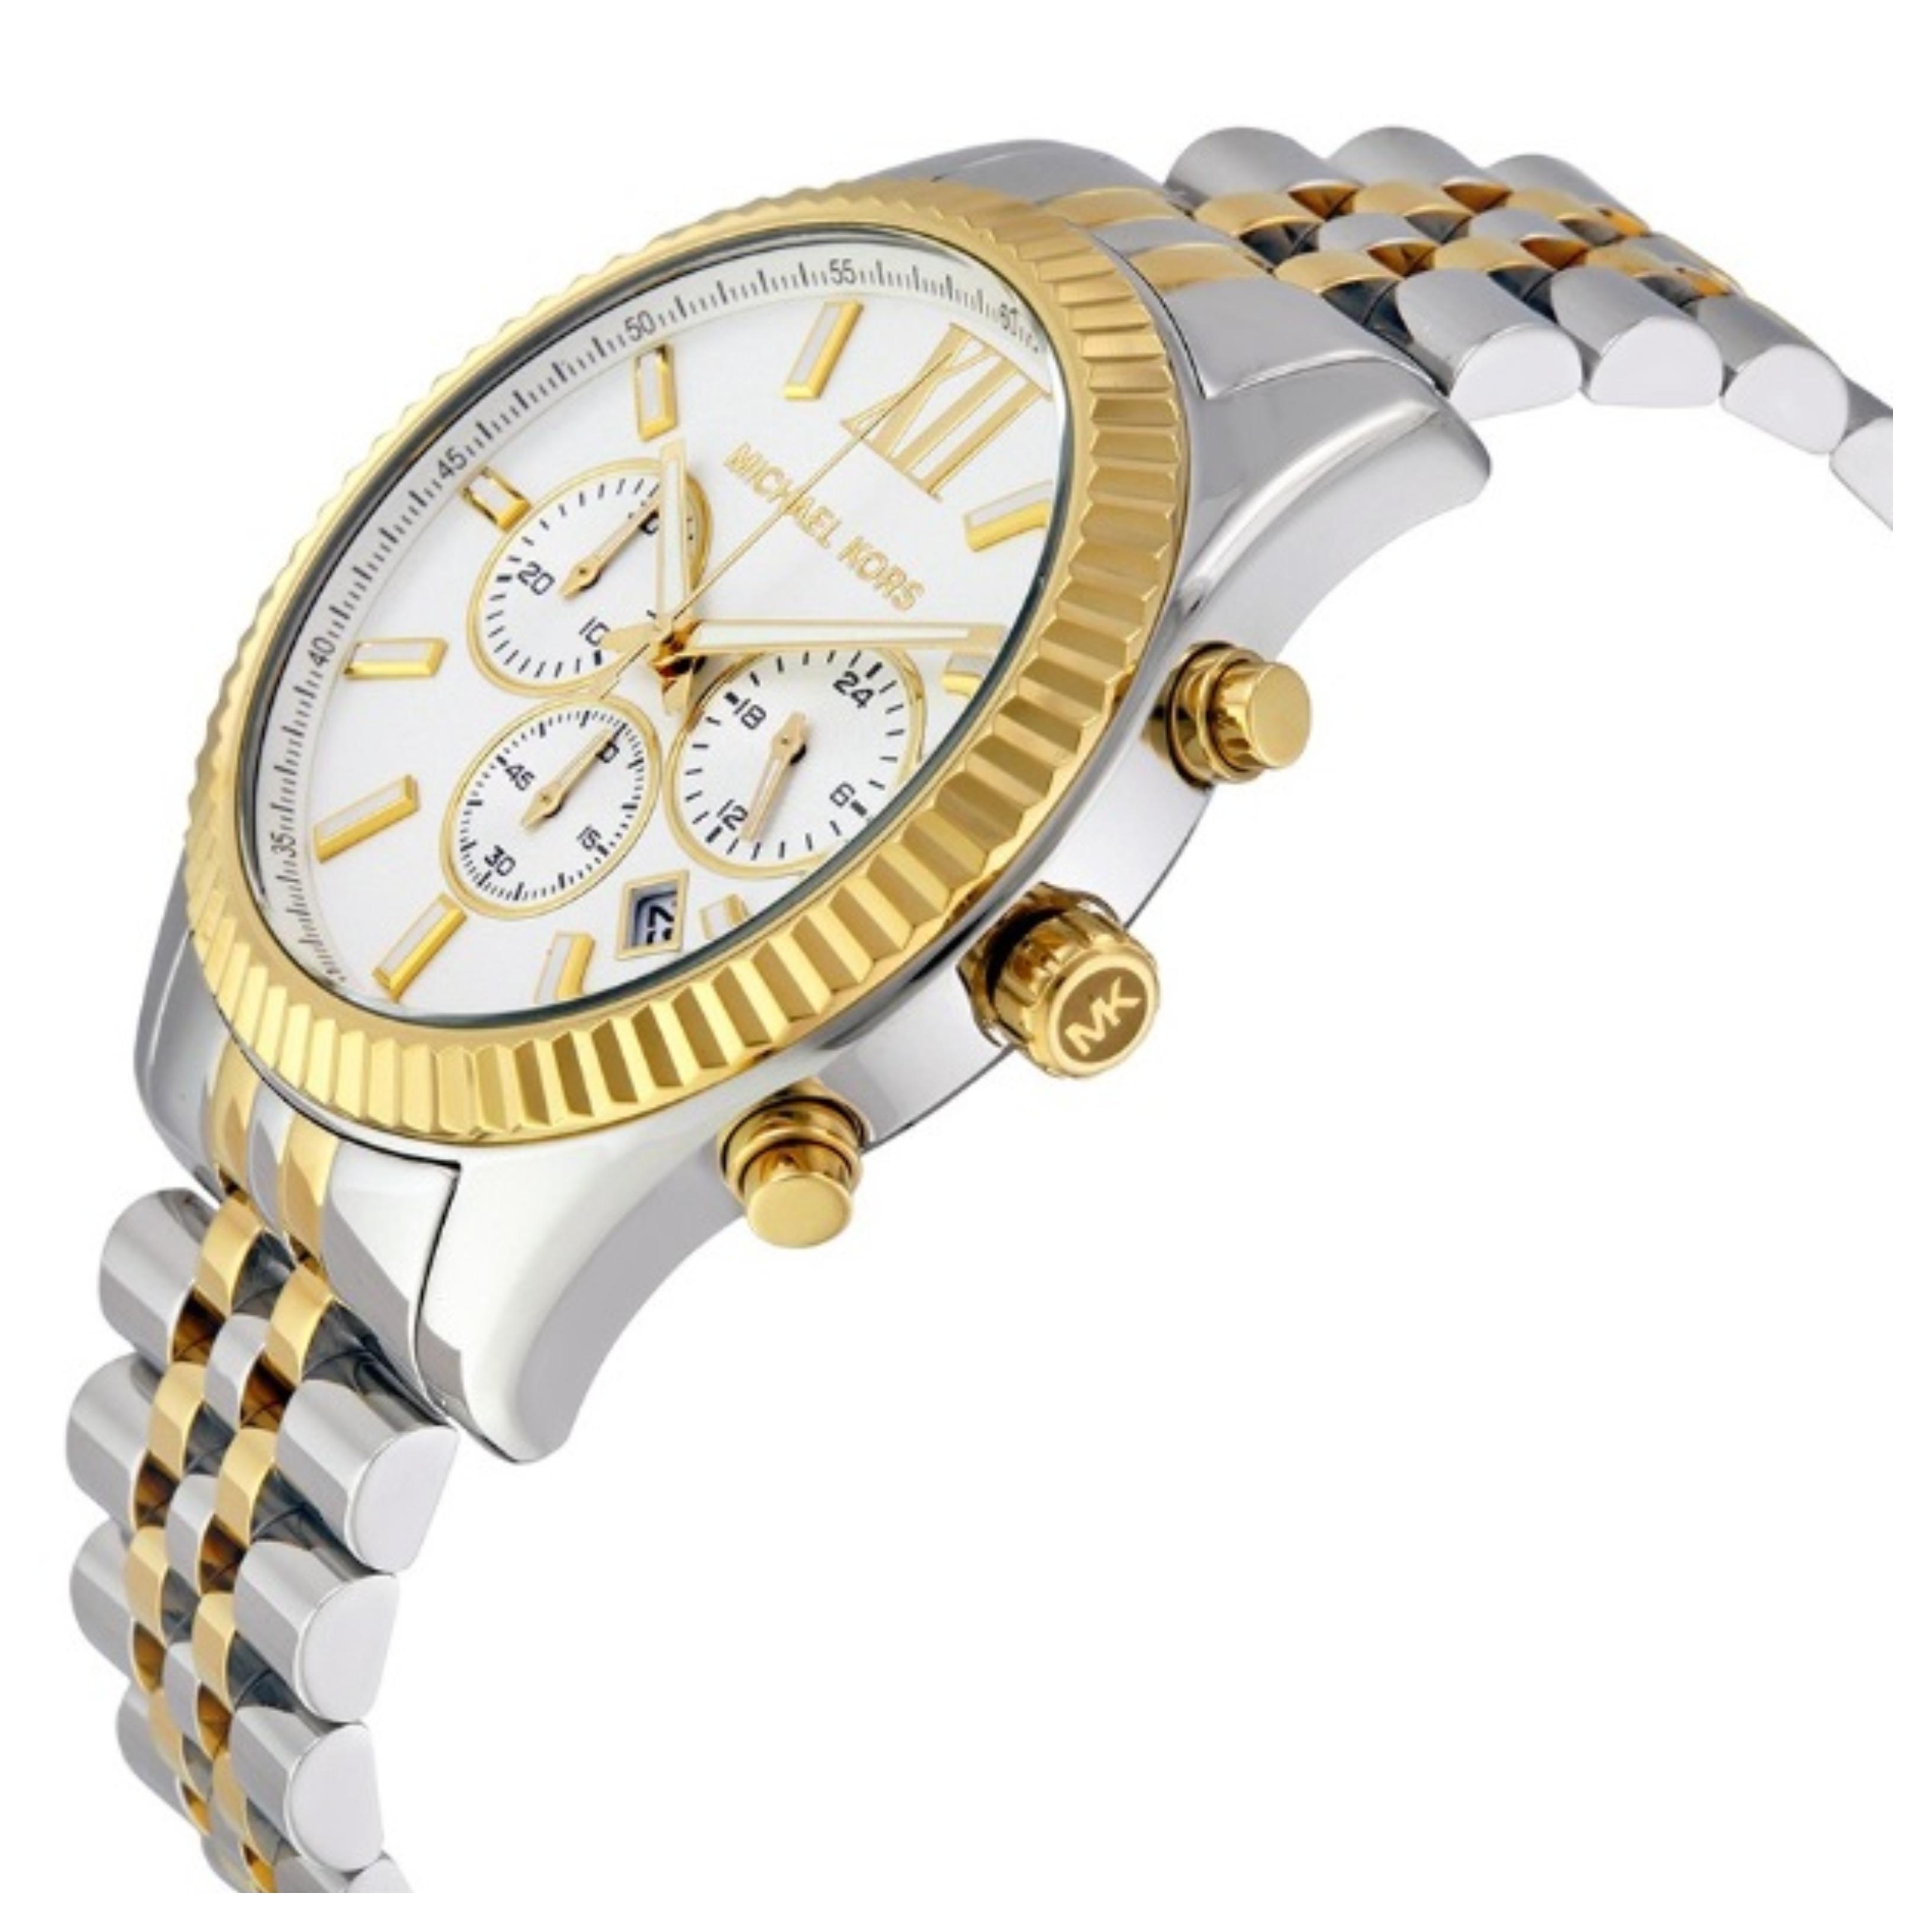 Sentinel Michael Kors Lexington Men s Formal Watch│Chronograph Dial│Two Tone  Strap│MK8344 8ed00873728